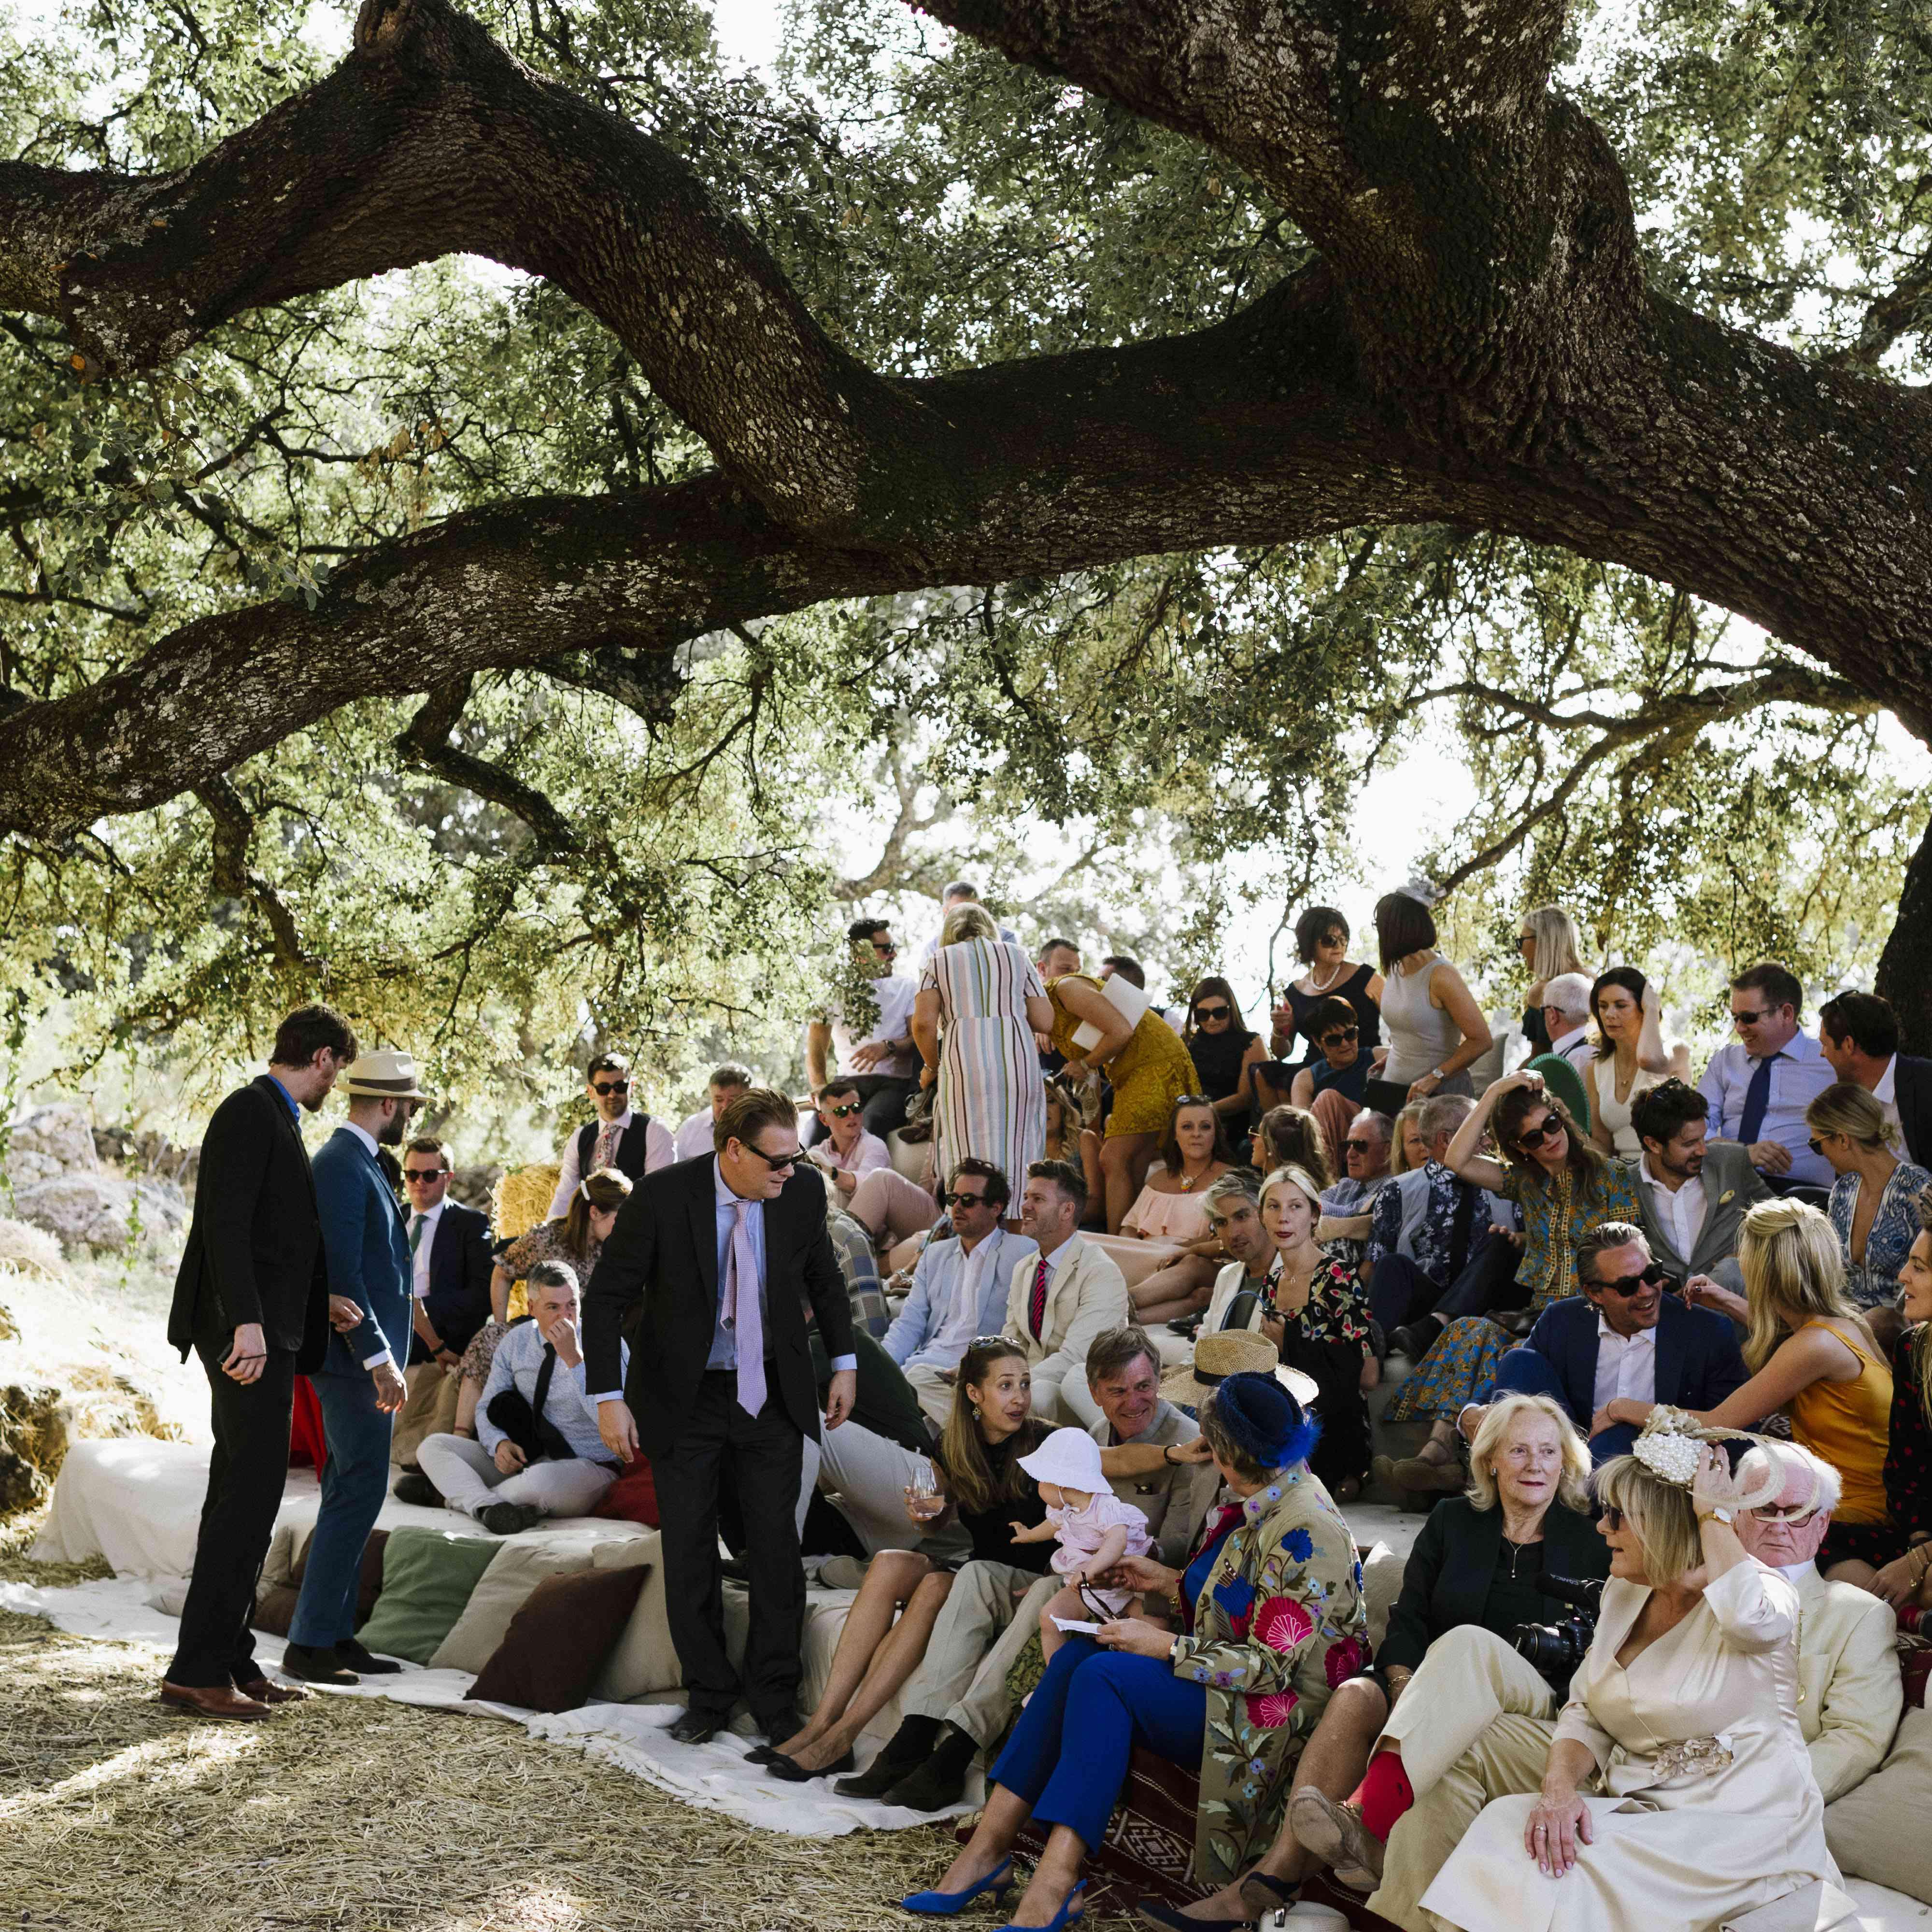 ceremony wedding guests